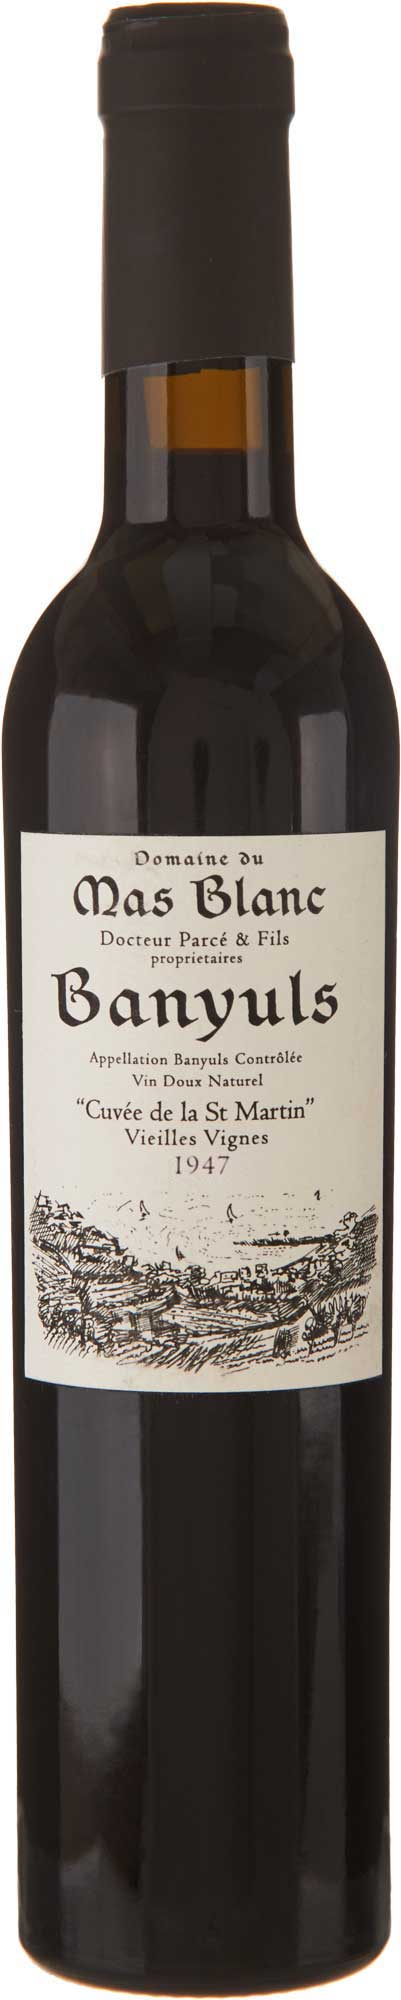 Domaine du Mas Blanc Banyuls 'Cuvée St. Martin' 1947